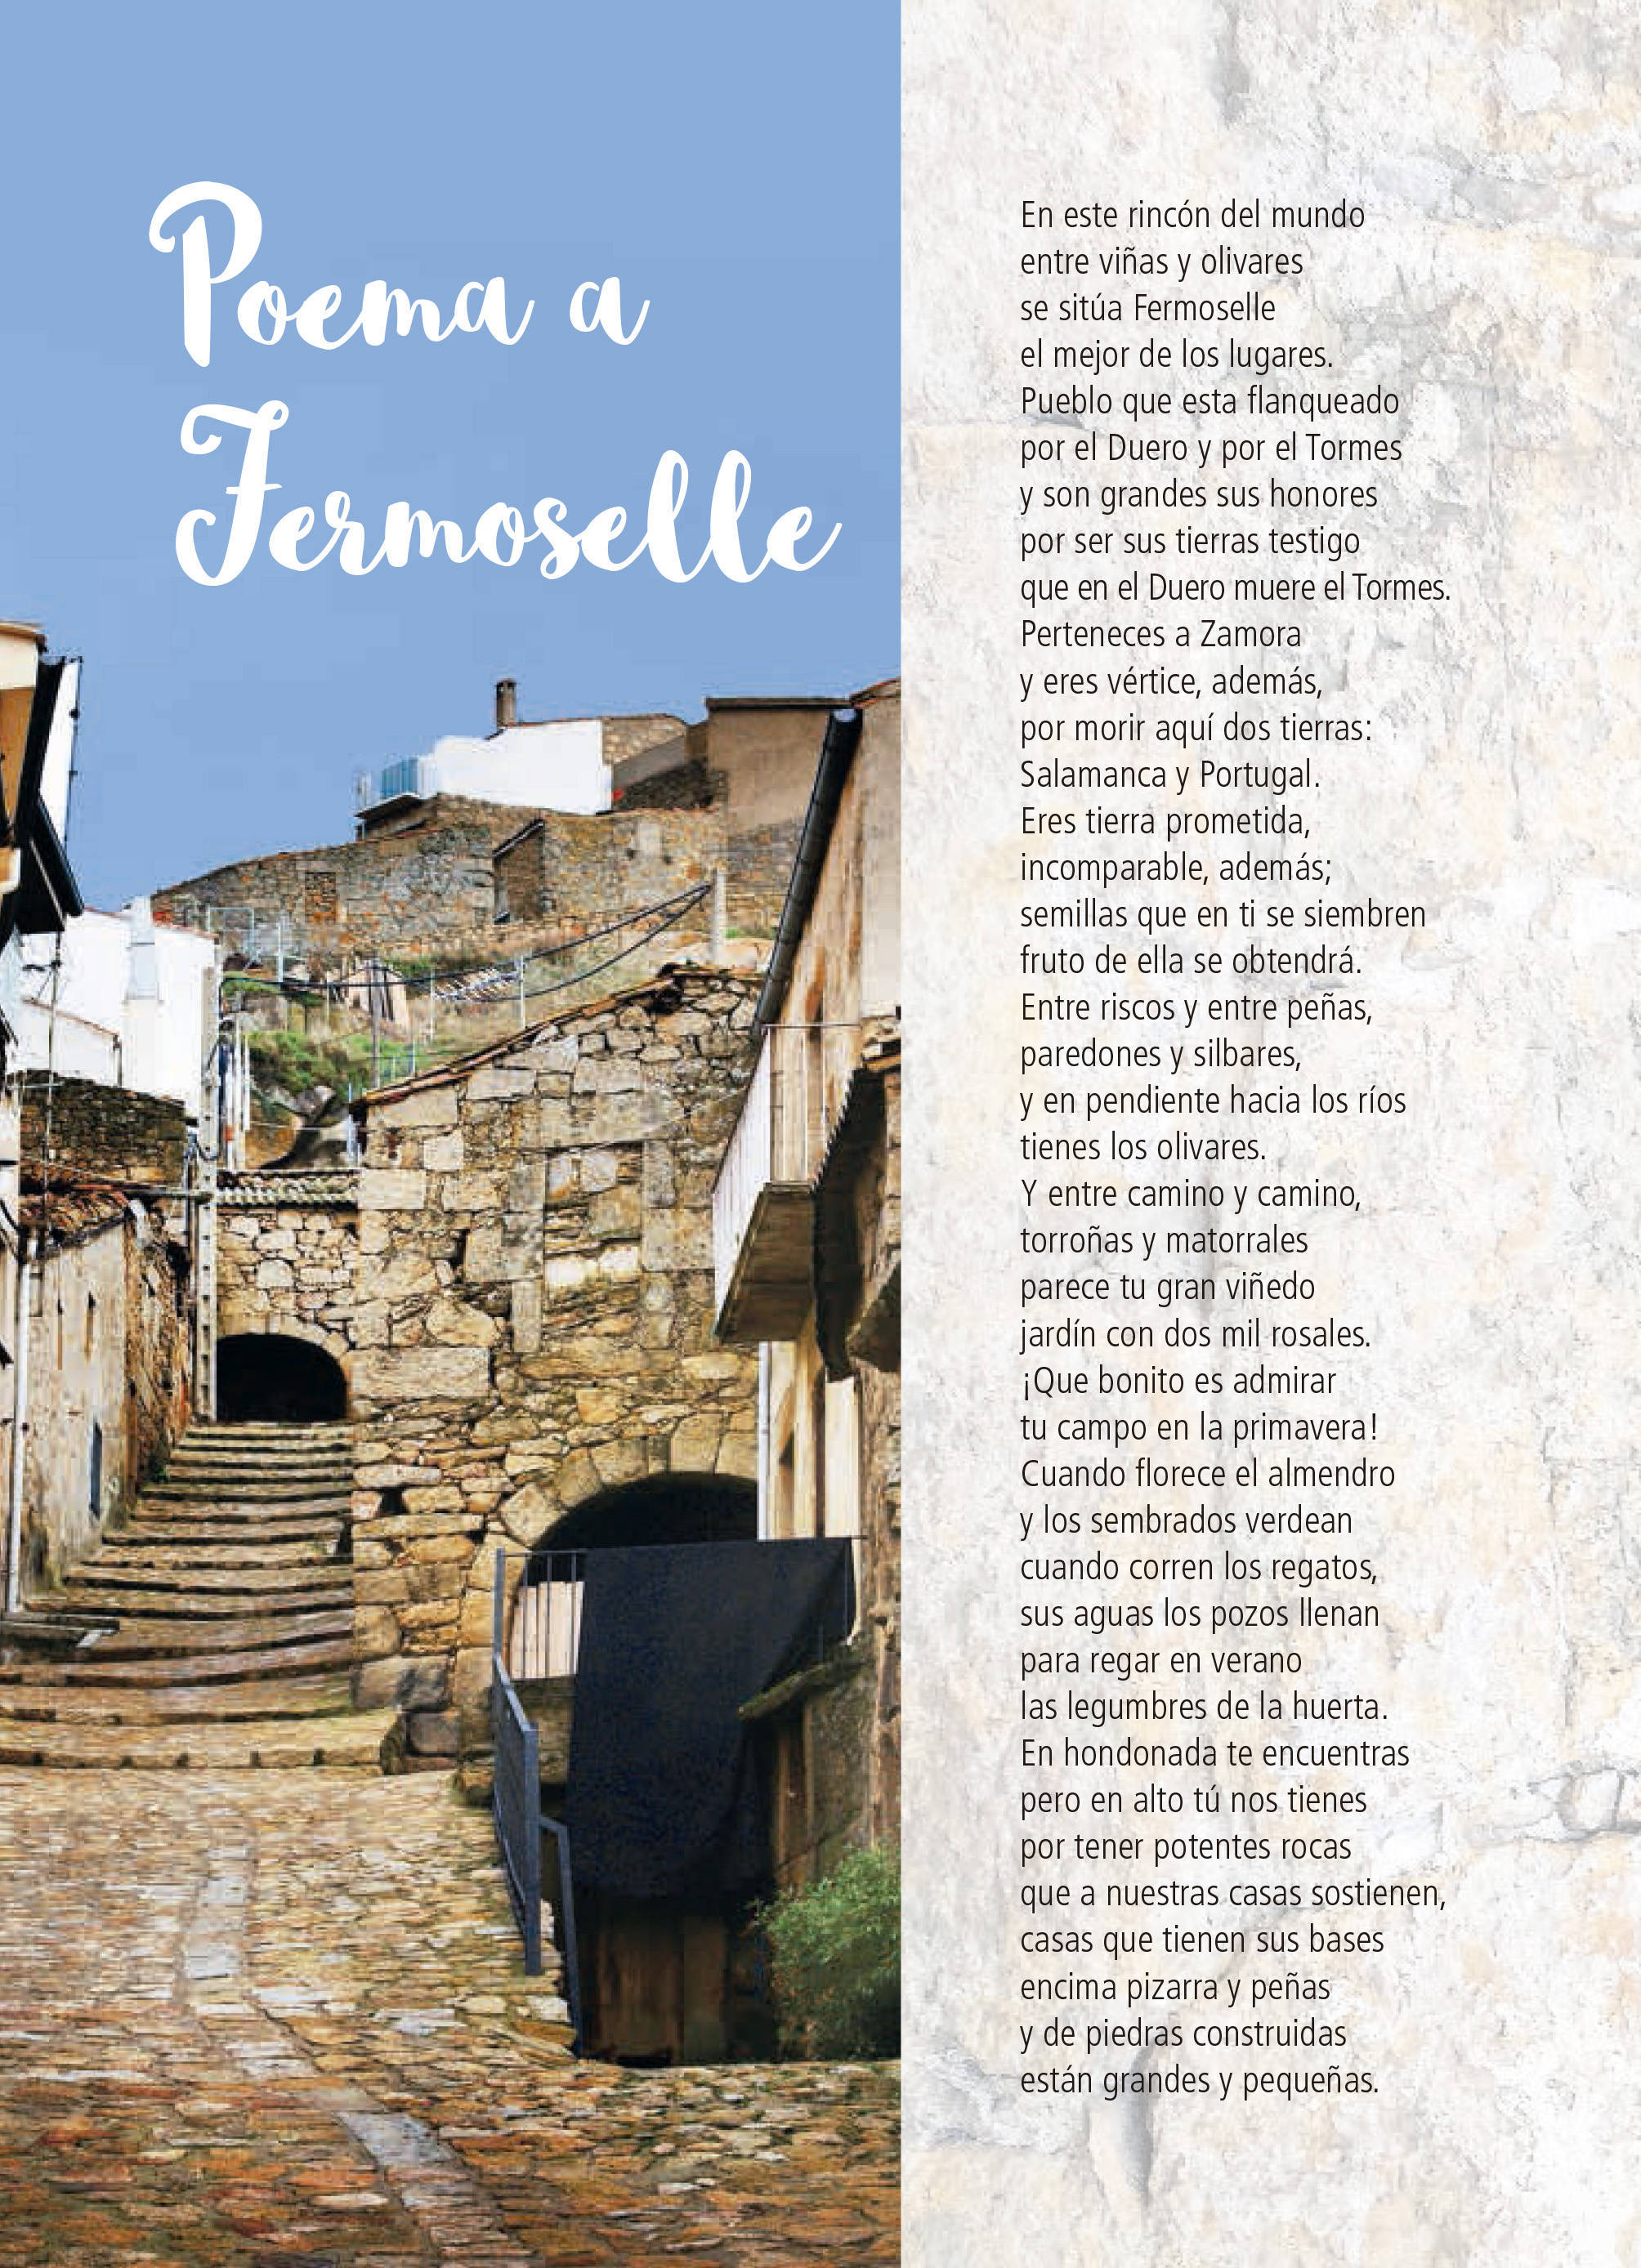 Programa de ferias y fiestas 2019 - Fermoselle (Zamora) 23